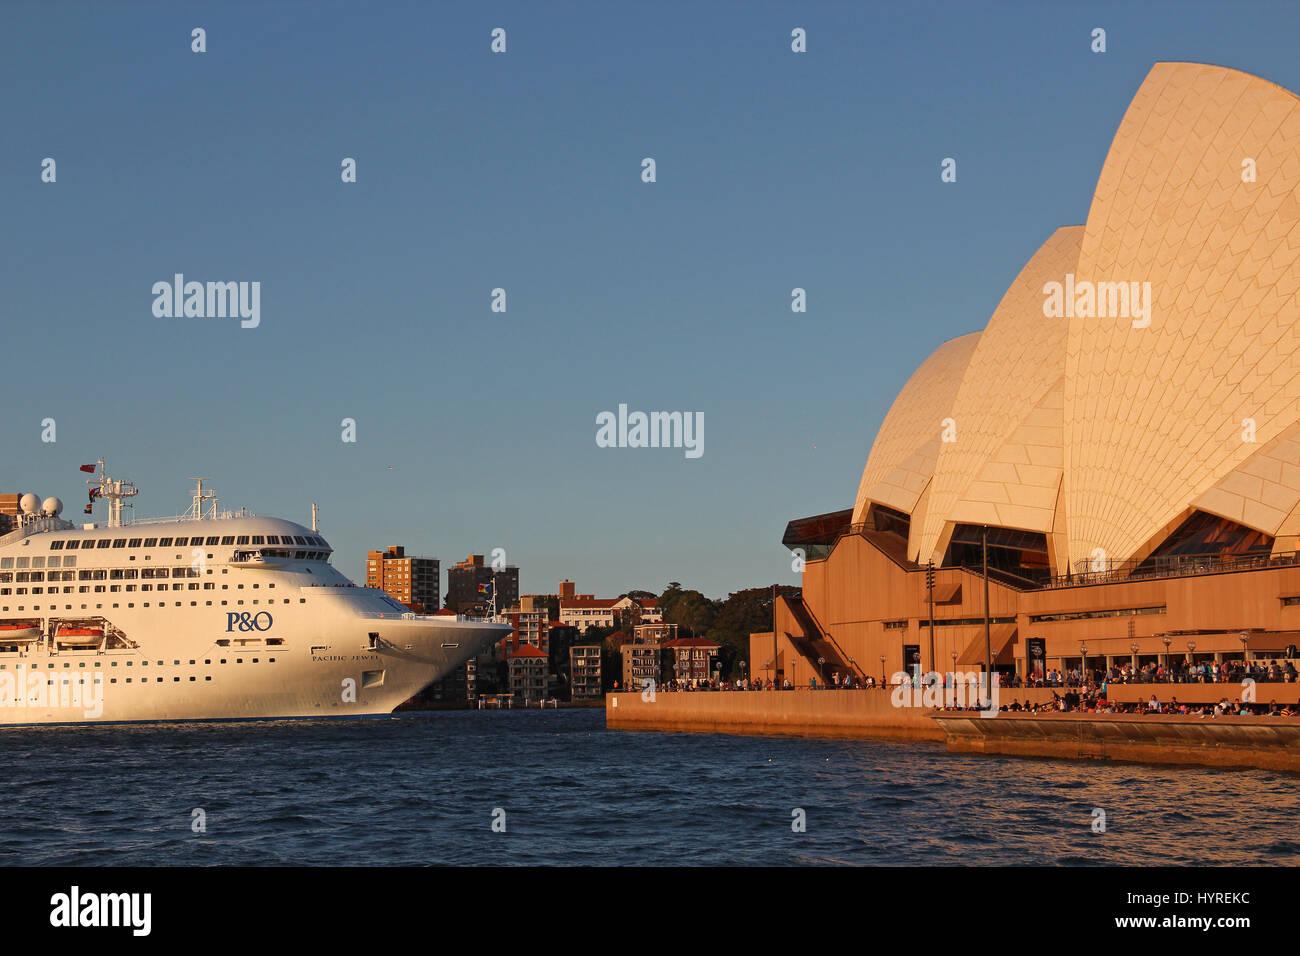 P&O Pacific Jewel cruise leaving with Sydney Harbour Bridge background, Australia - Stock Image